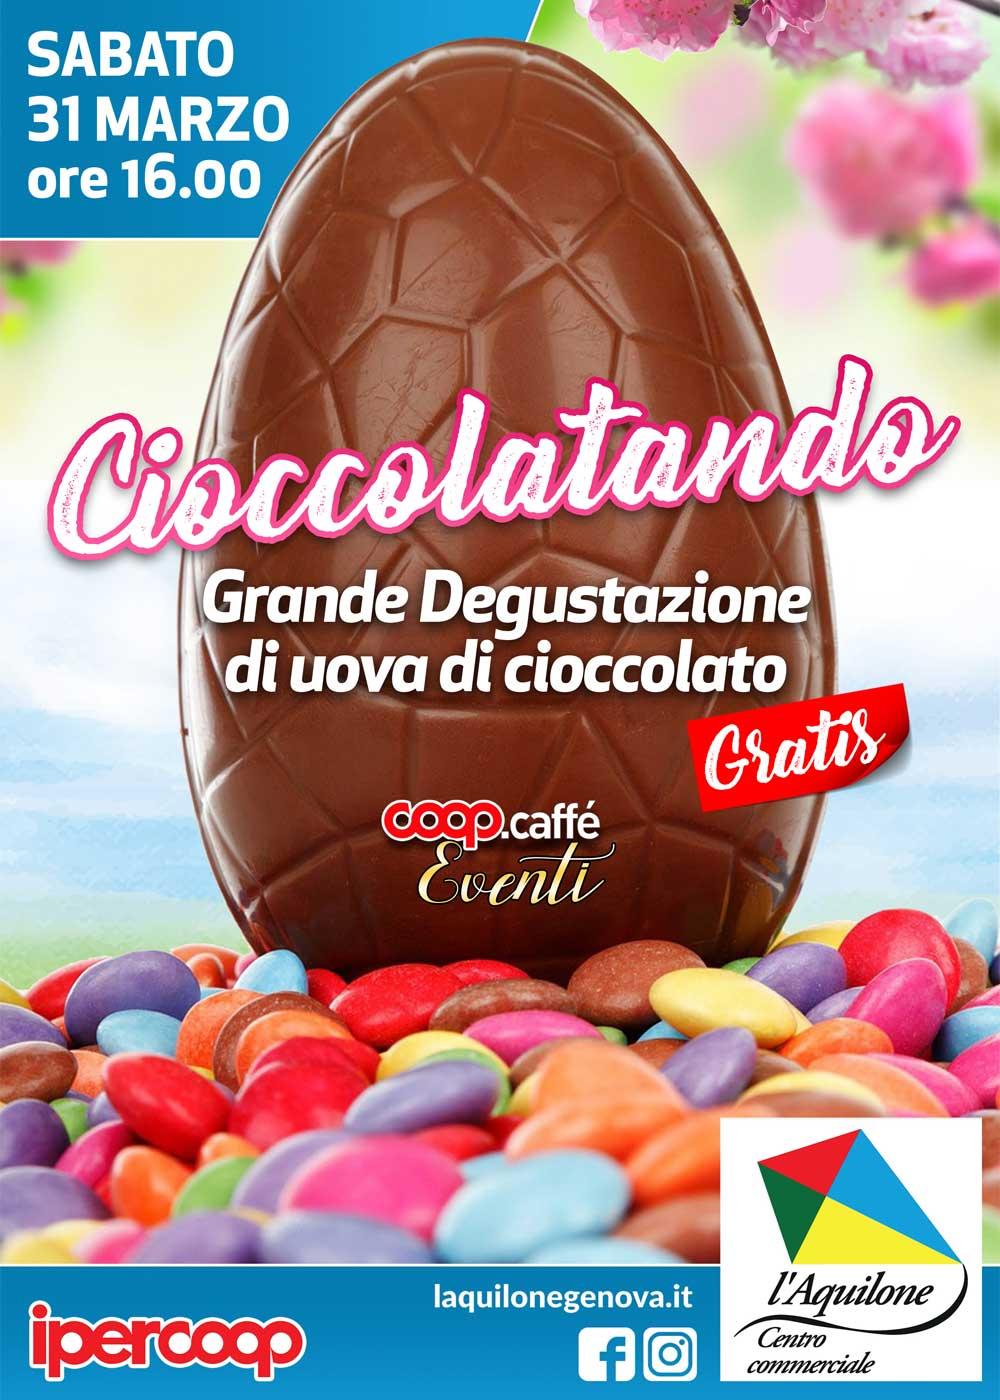 Cioccolatando